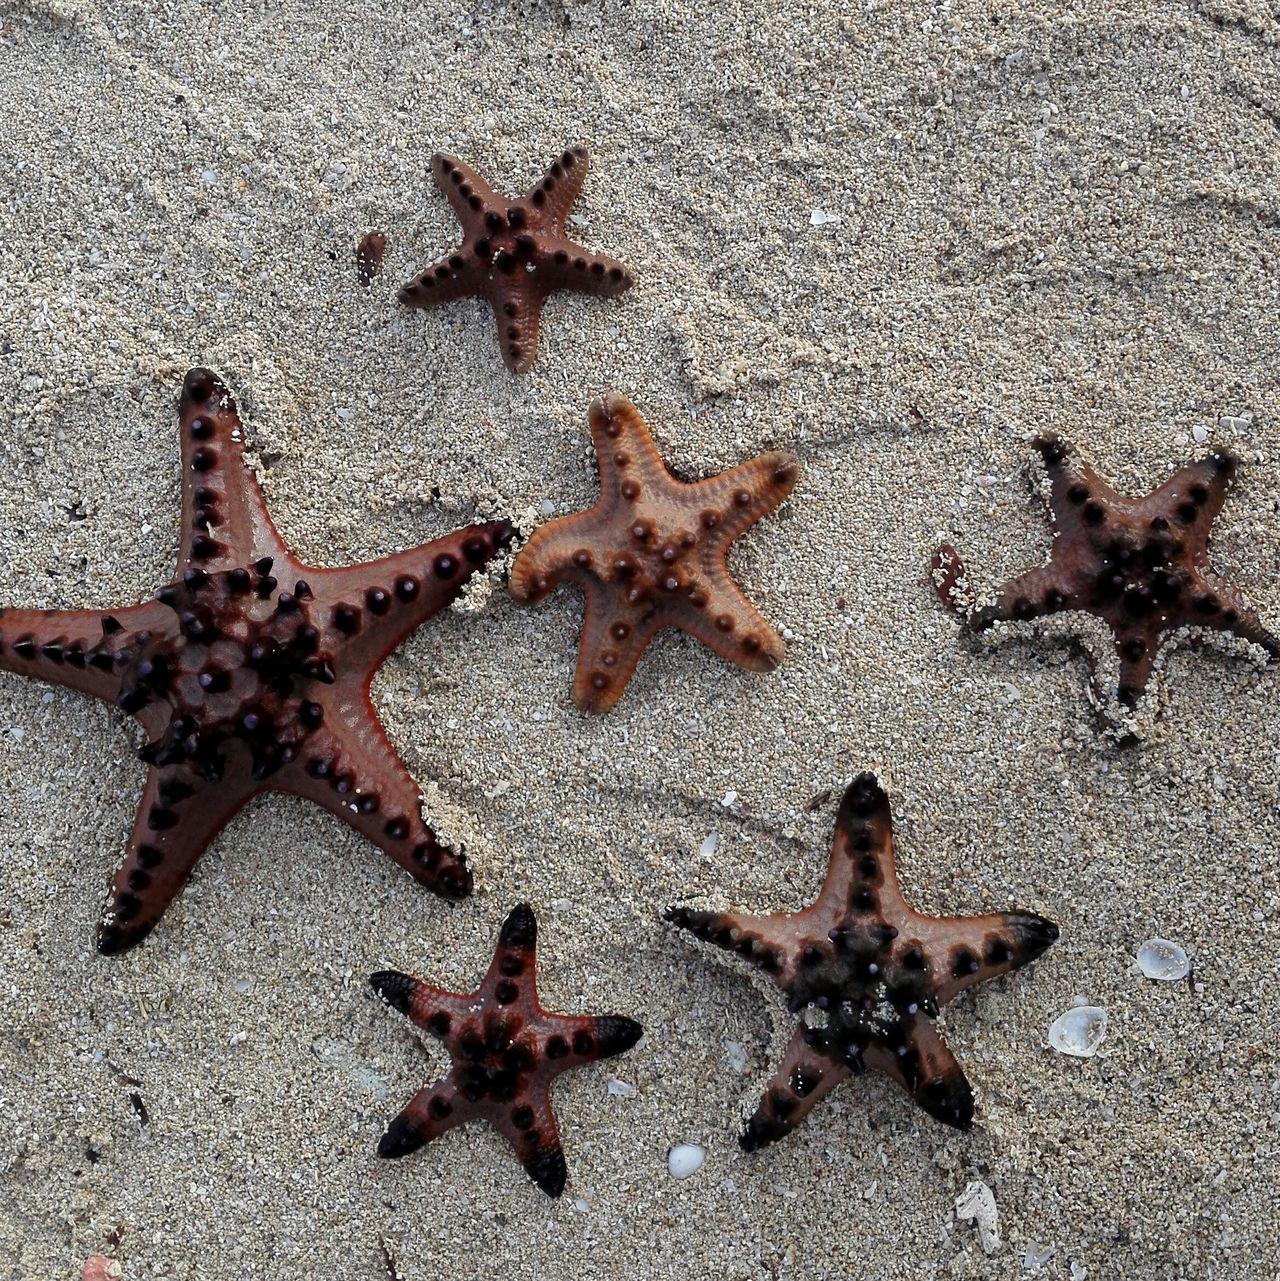 Starfish  Starfish At Beach Starfishes Zambales Magalawa Island Sand Beach Shore Outdoors Sea Life Philippines Photography Sea No People